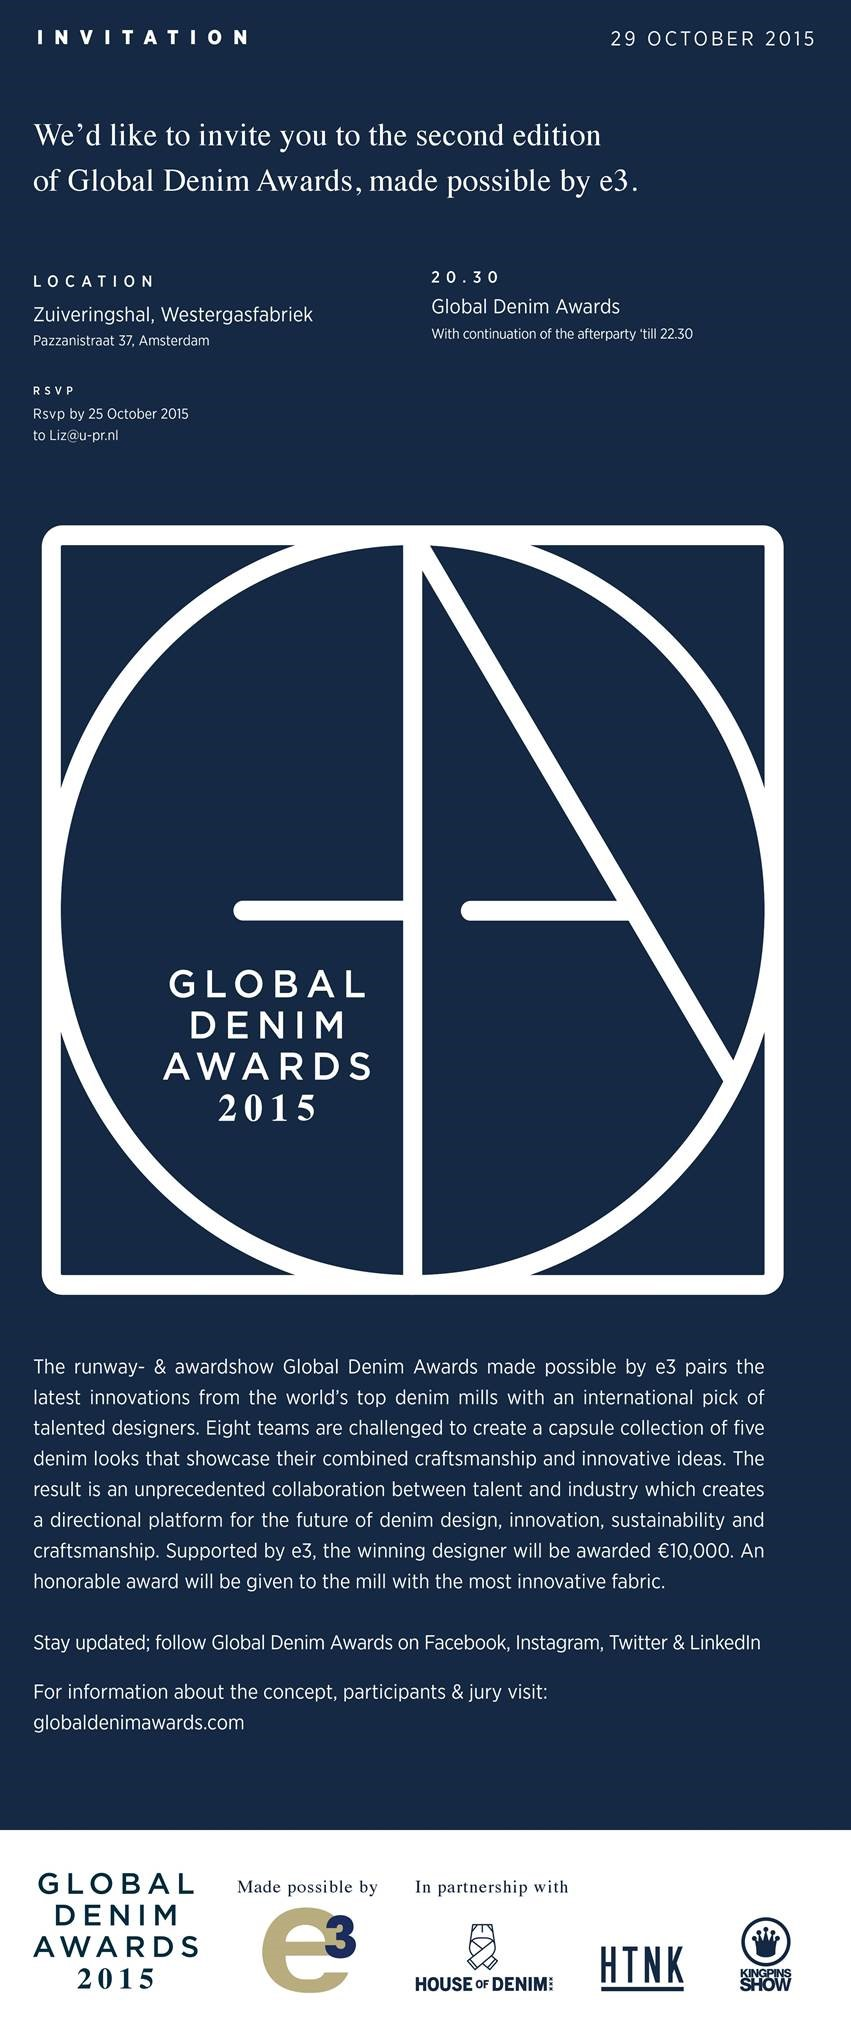 global denim awards long john blog jeans denim event amsterdam invitation 2015 westergasfabriek selvage selvedge